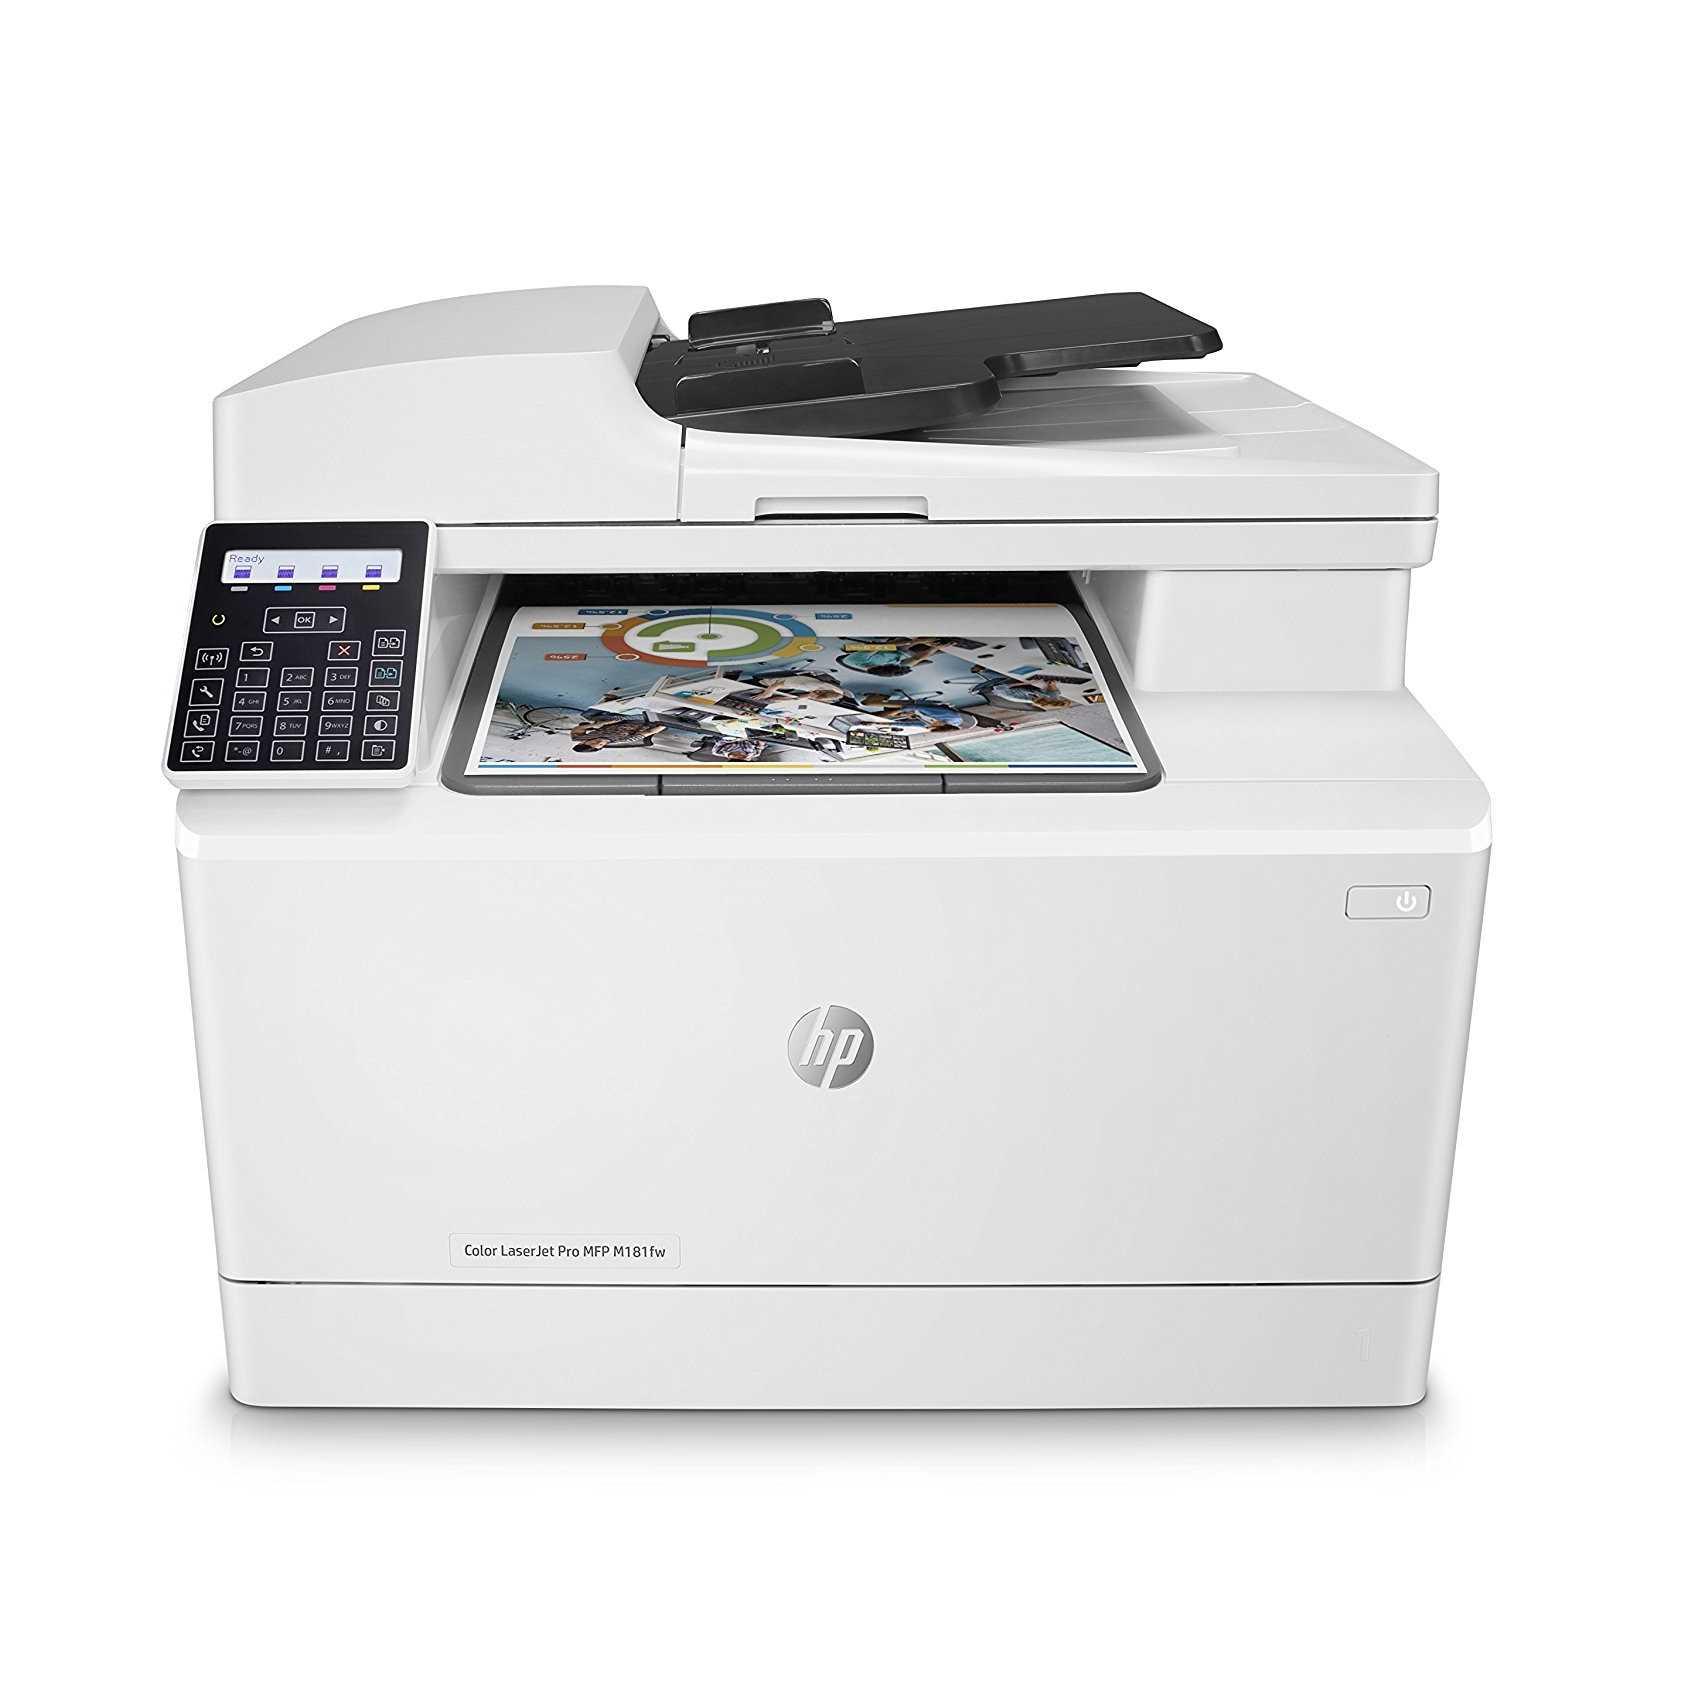 HP Color LaserJet Pro M181FW Laser Multifunction Printer